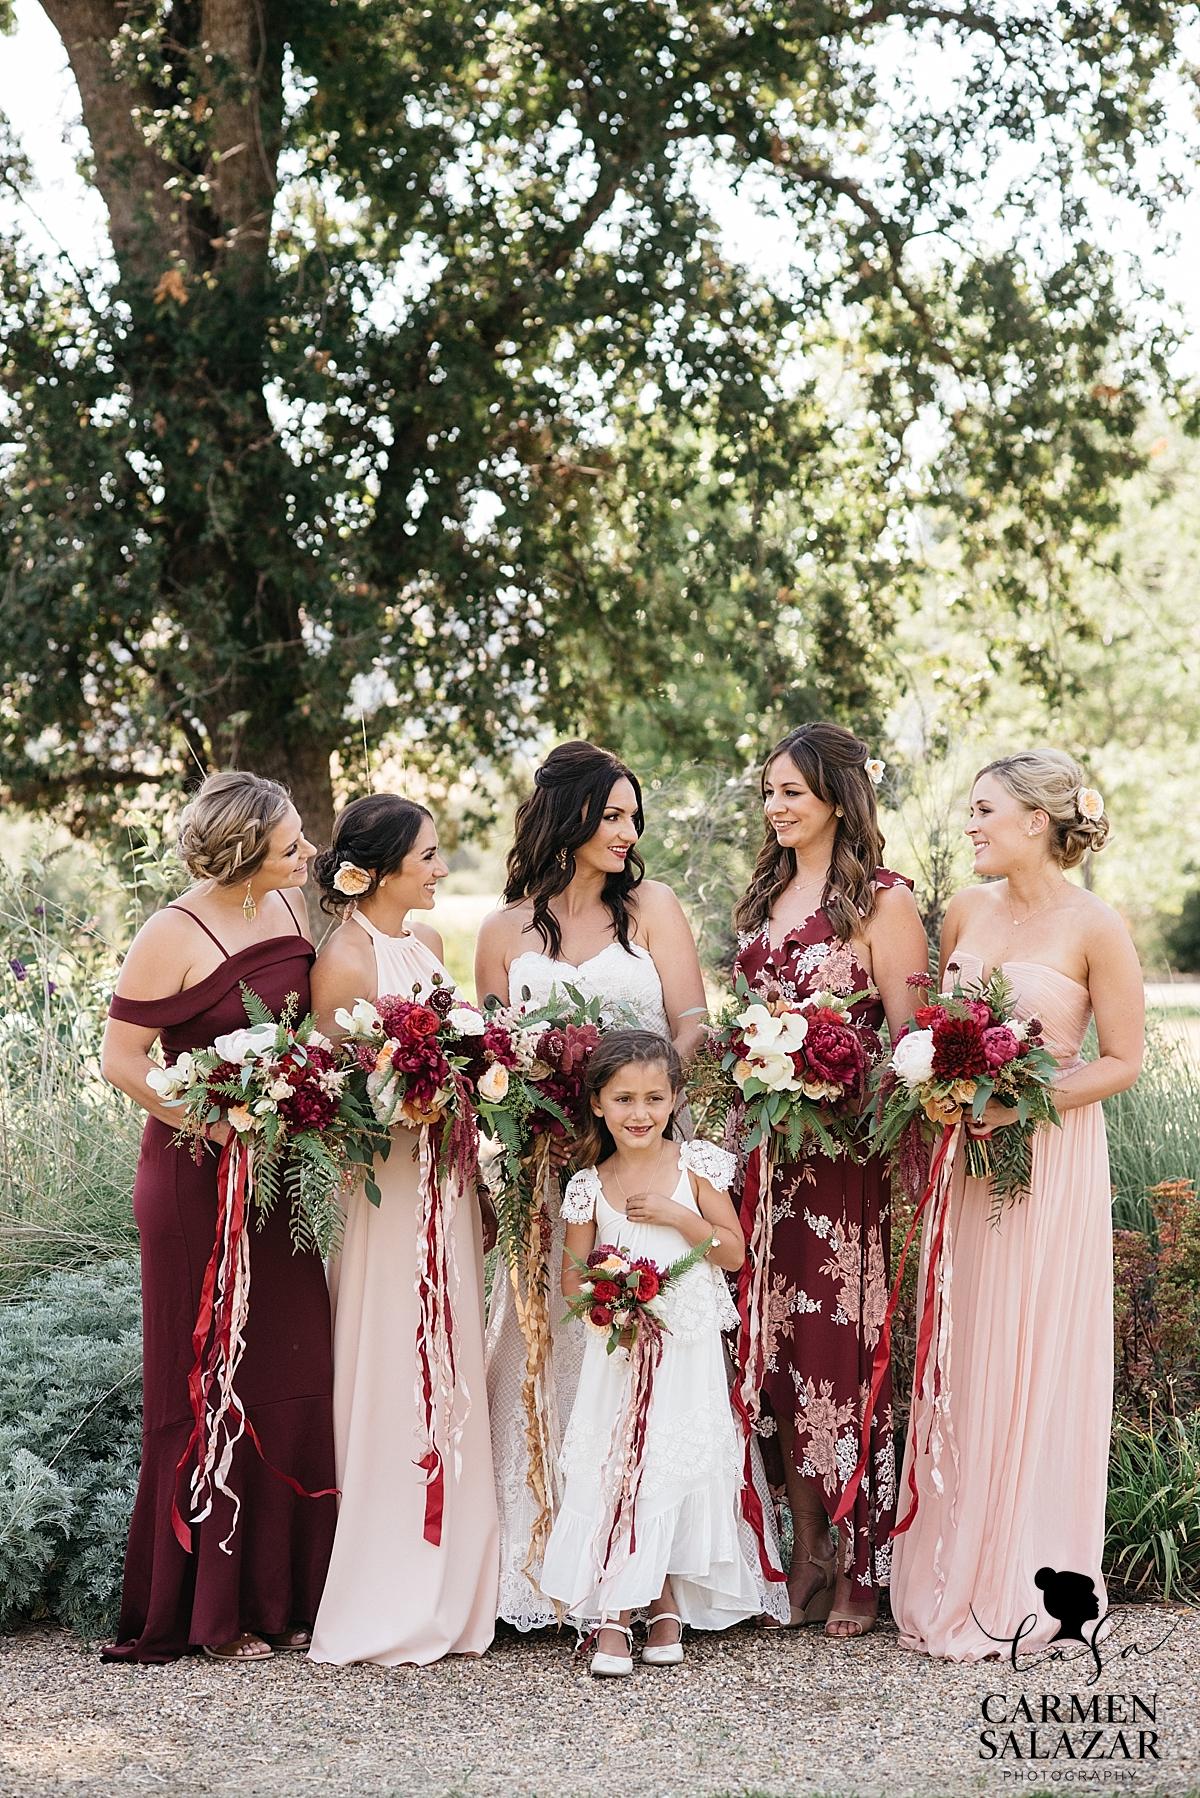 Boho glam bridesmaid style - Carmen Salazar